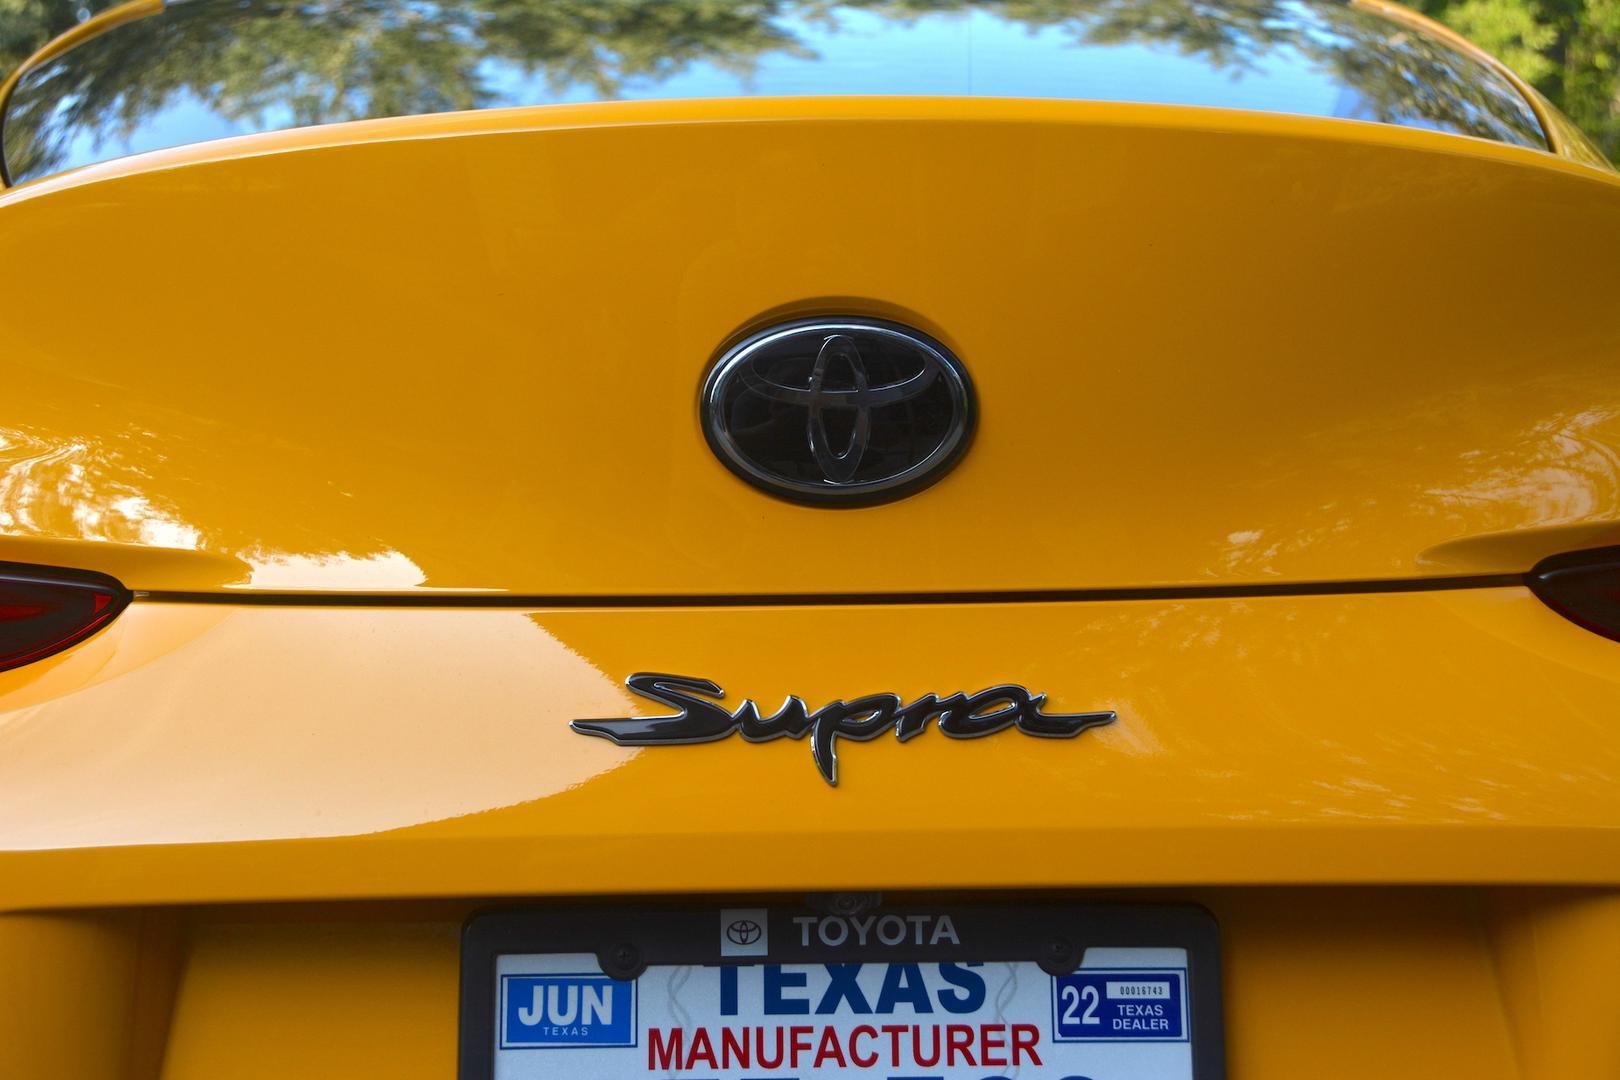 Toyota GR Supra rear badge